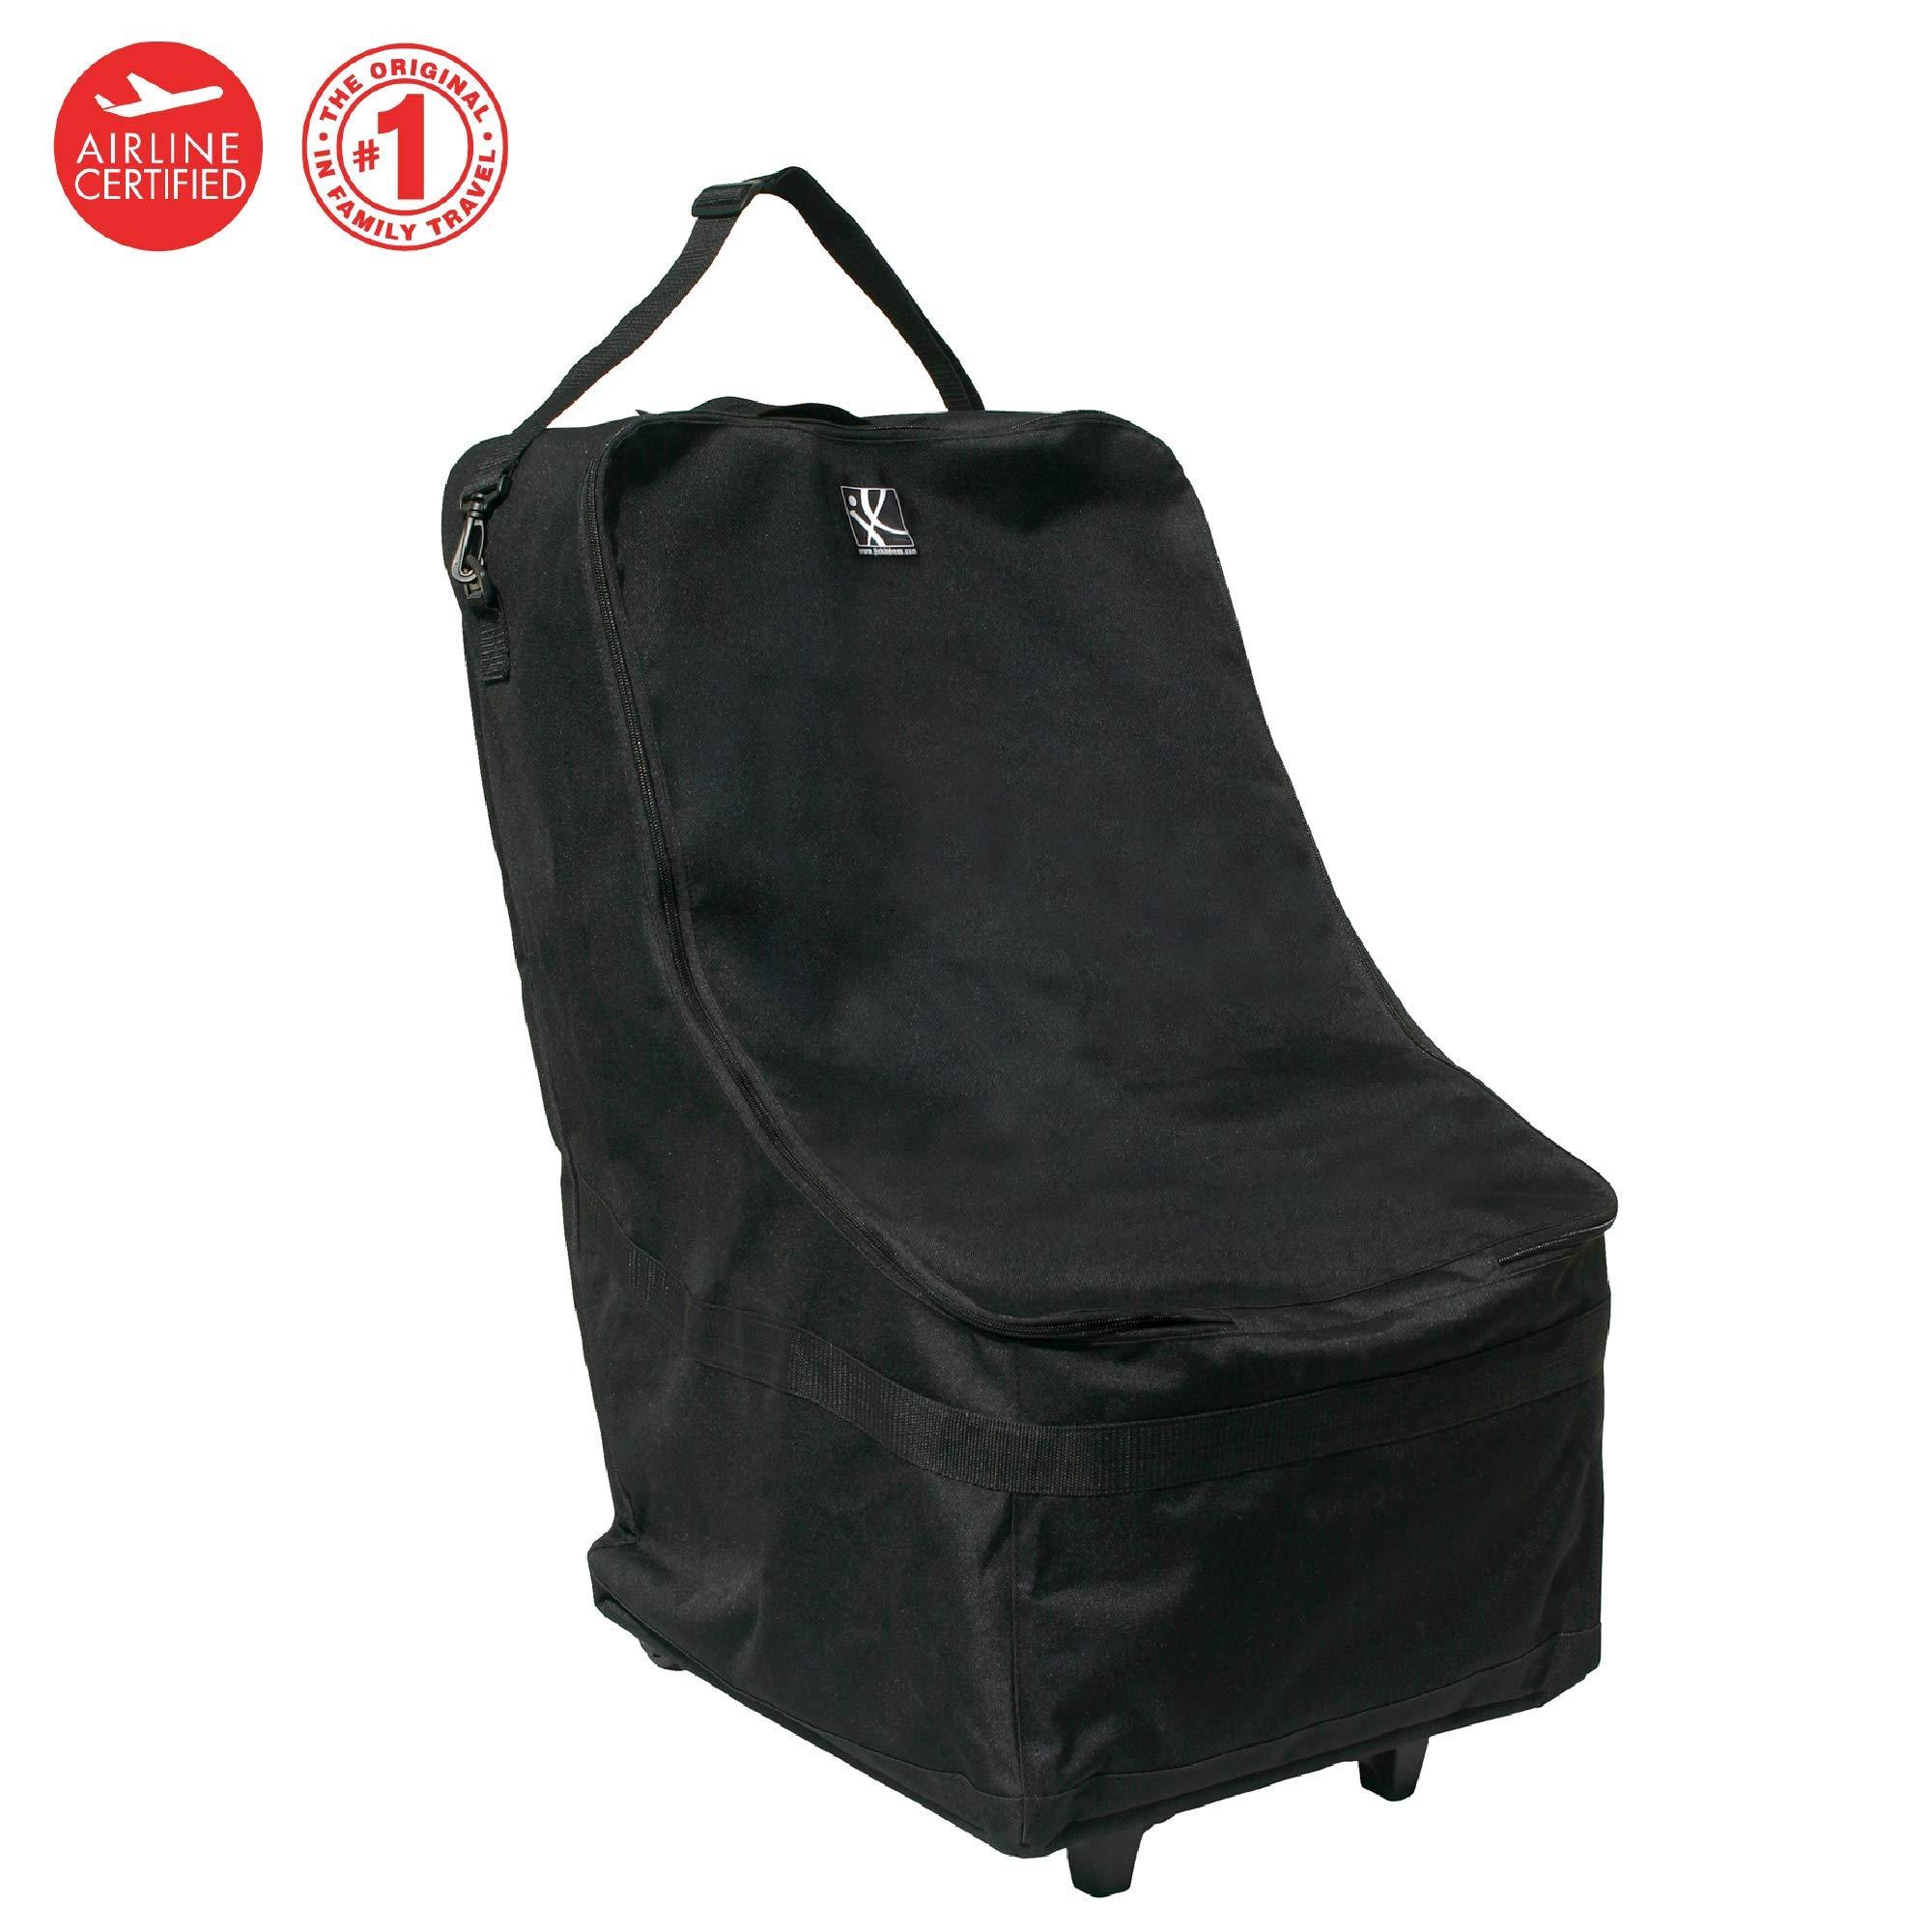 J.L. Childress Wheelie Car Seat Travel Bag, Black by J.L. Childress